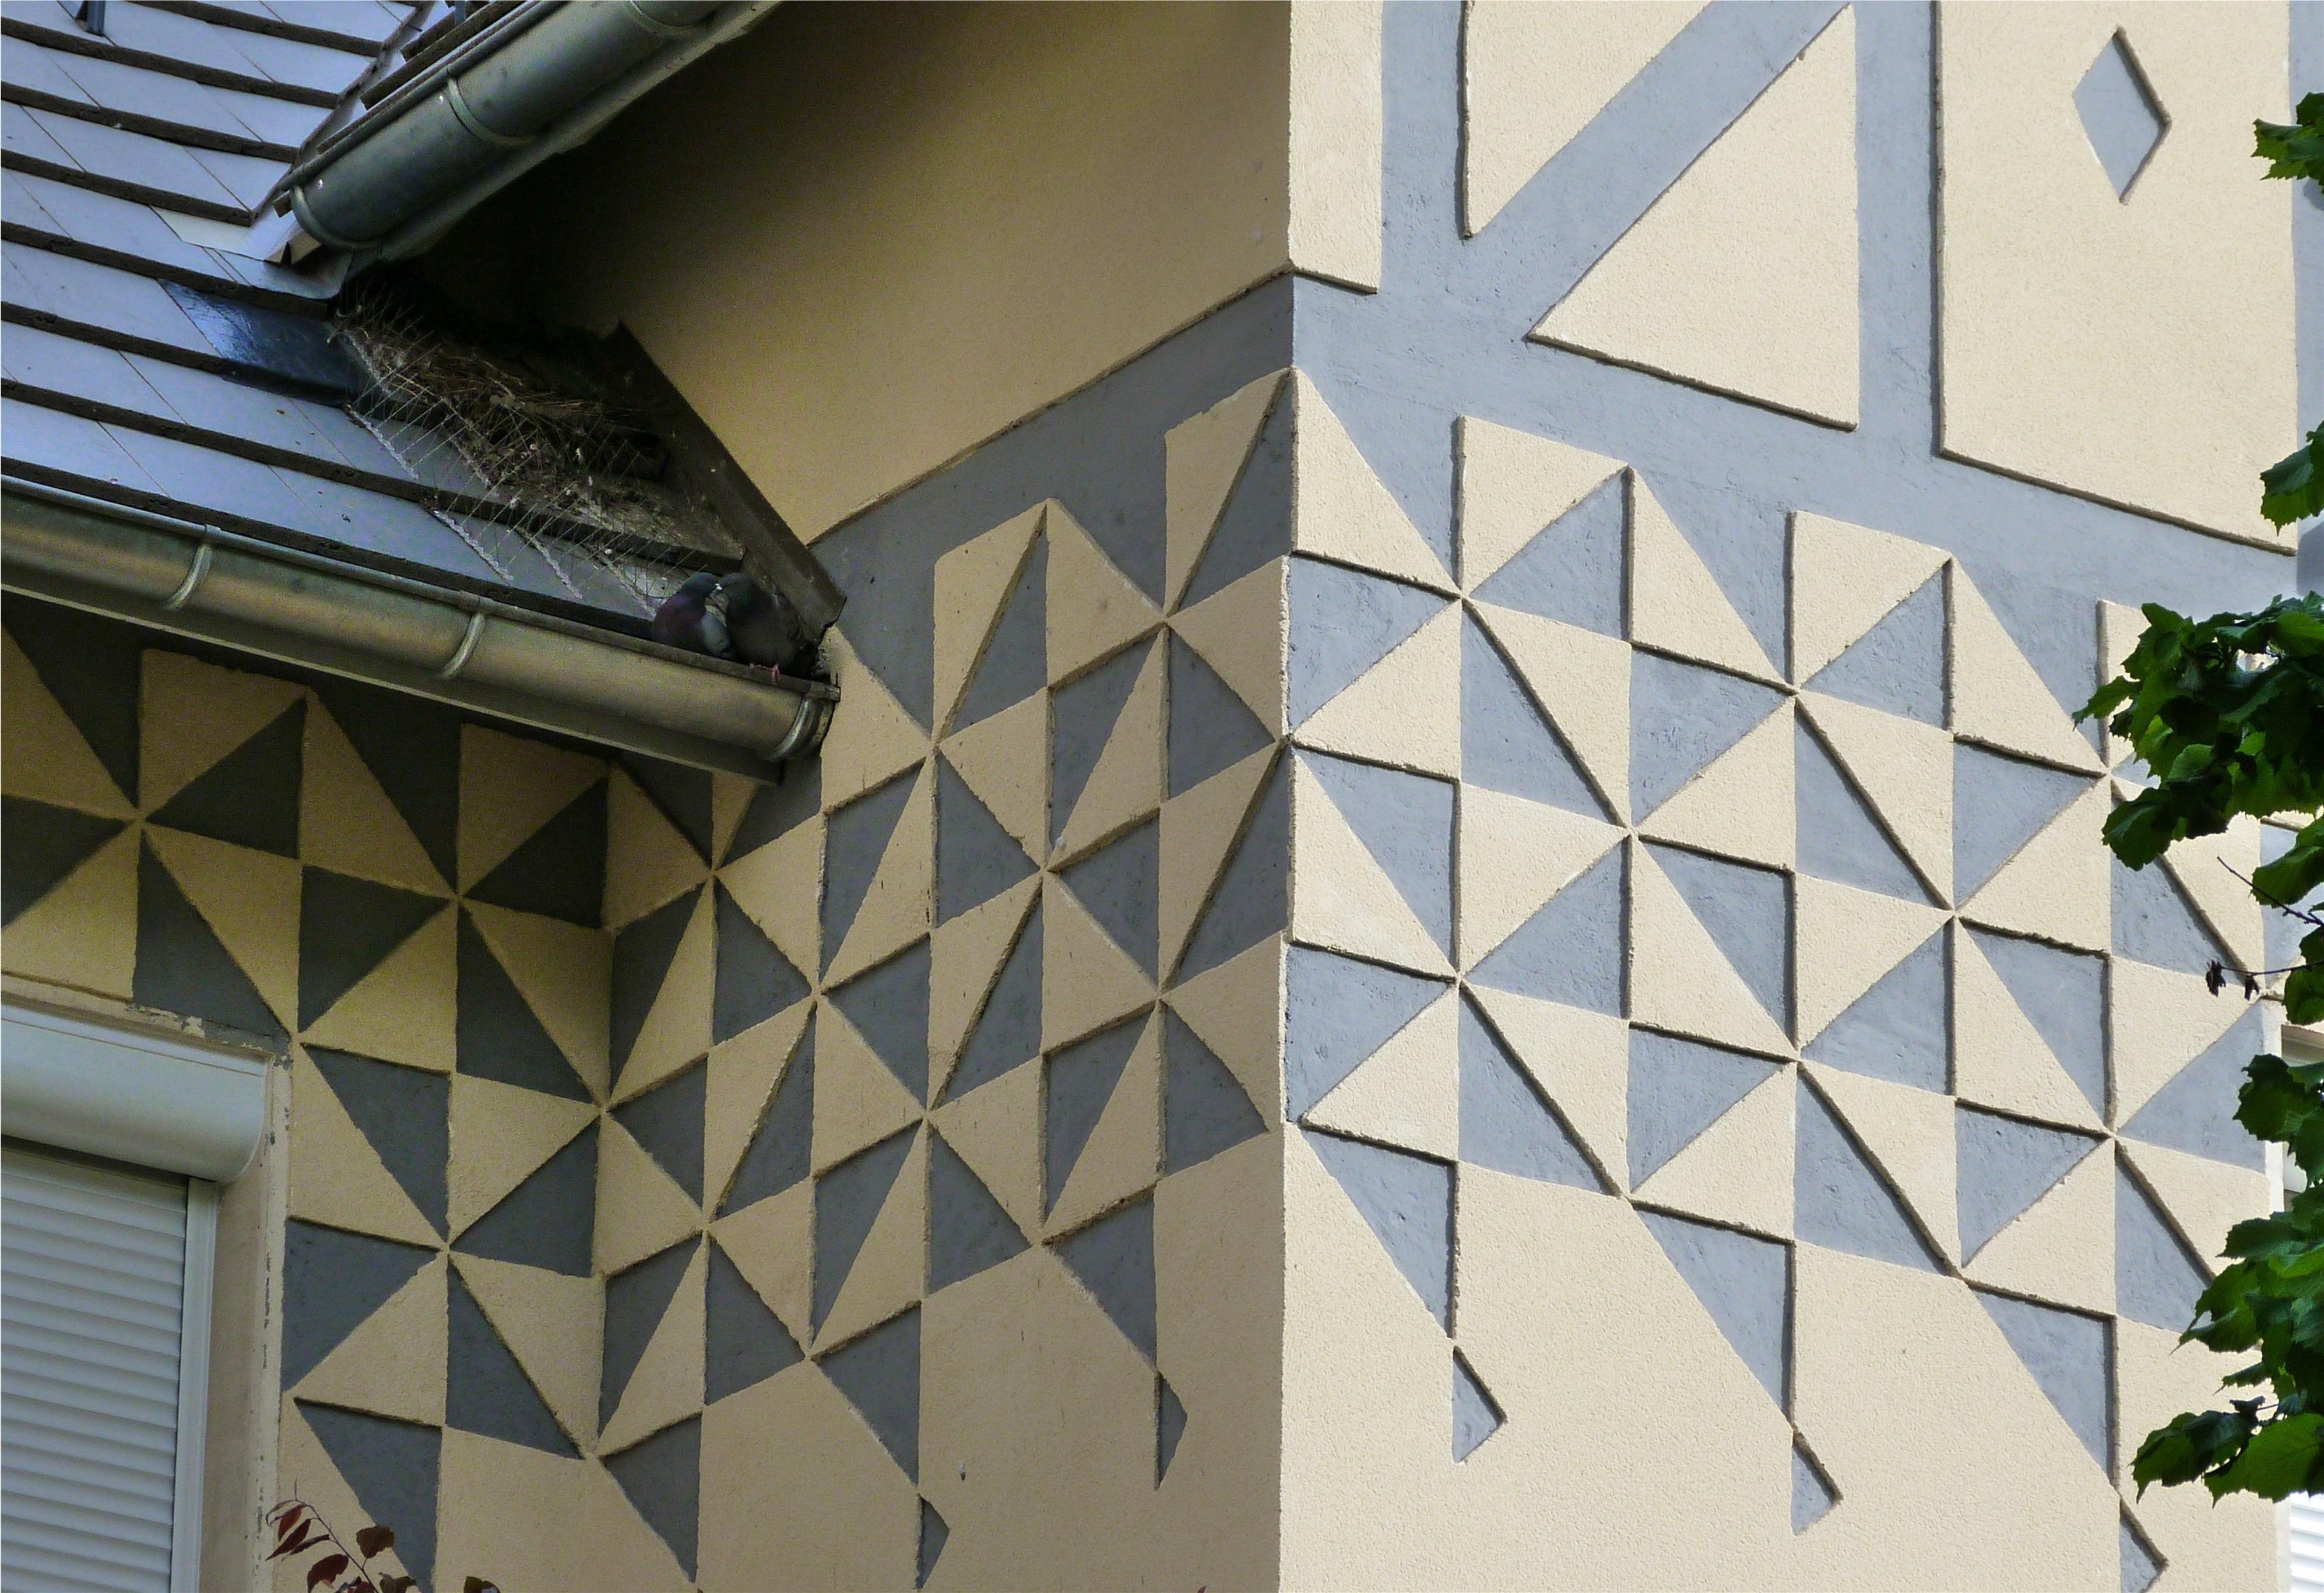 gambar : arsitektur, jendela, atap, dinding, geometri, warna, kotak